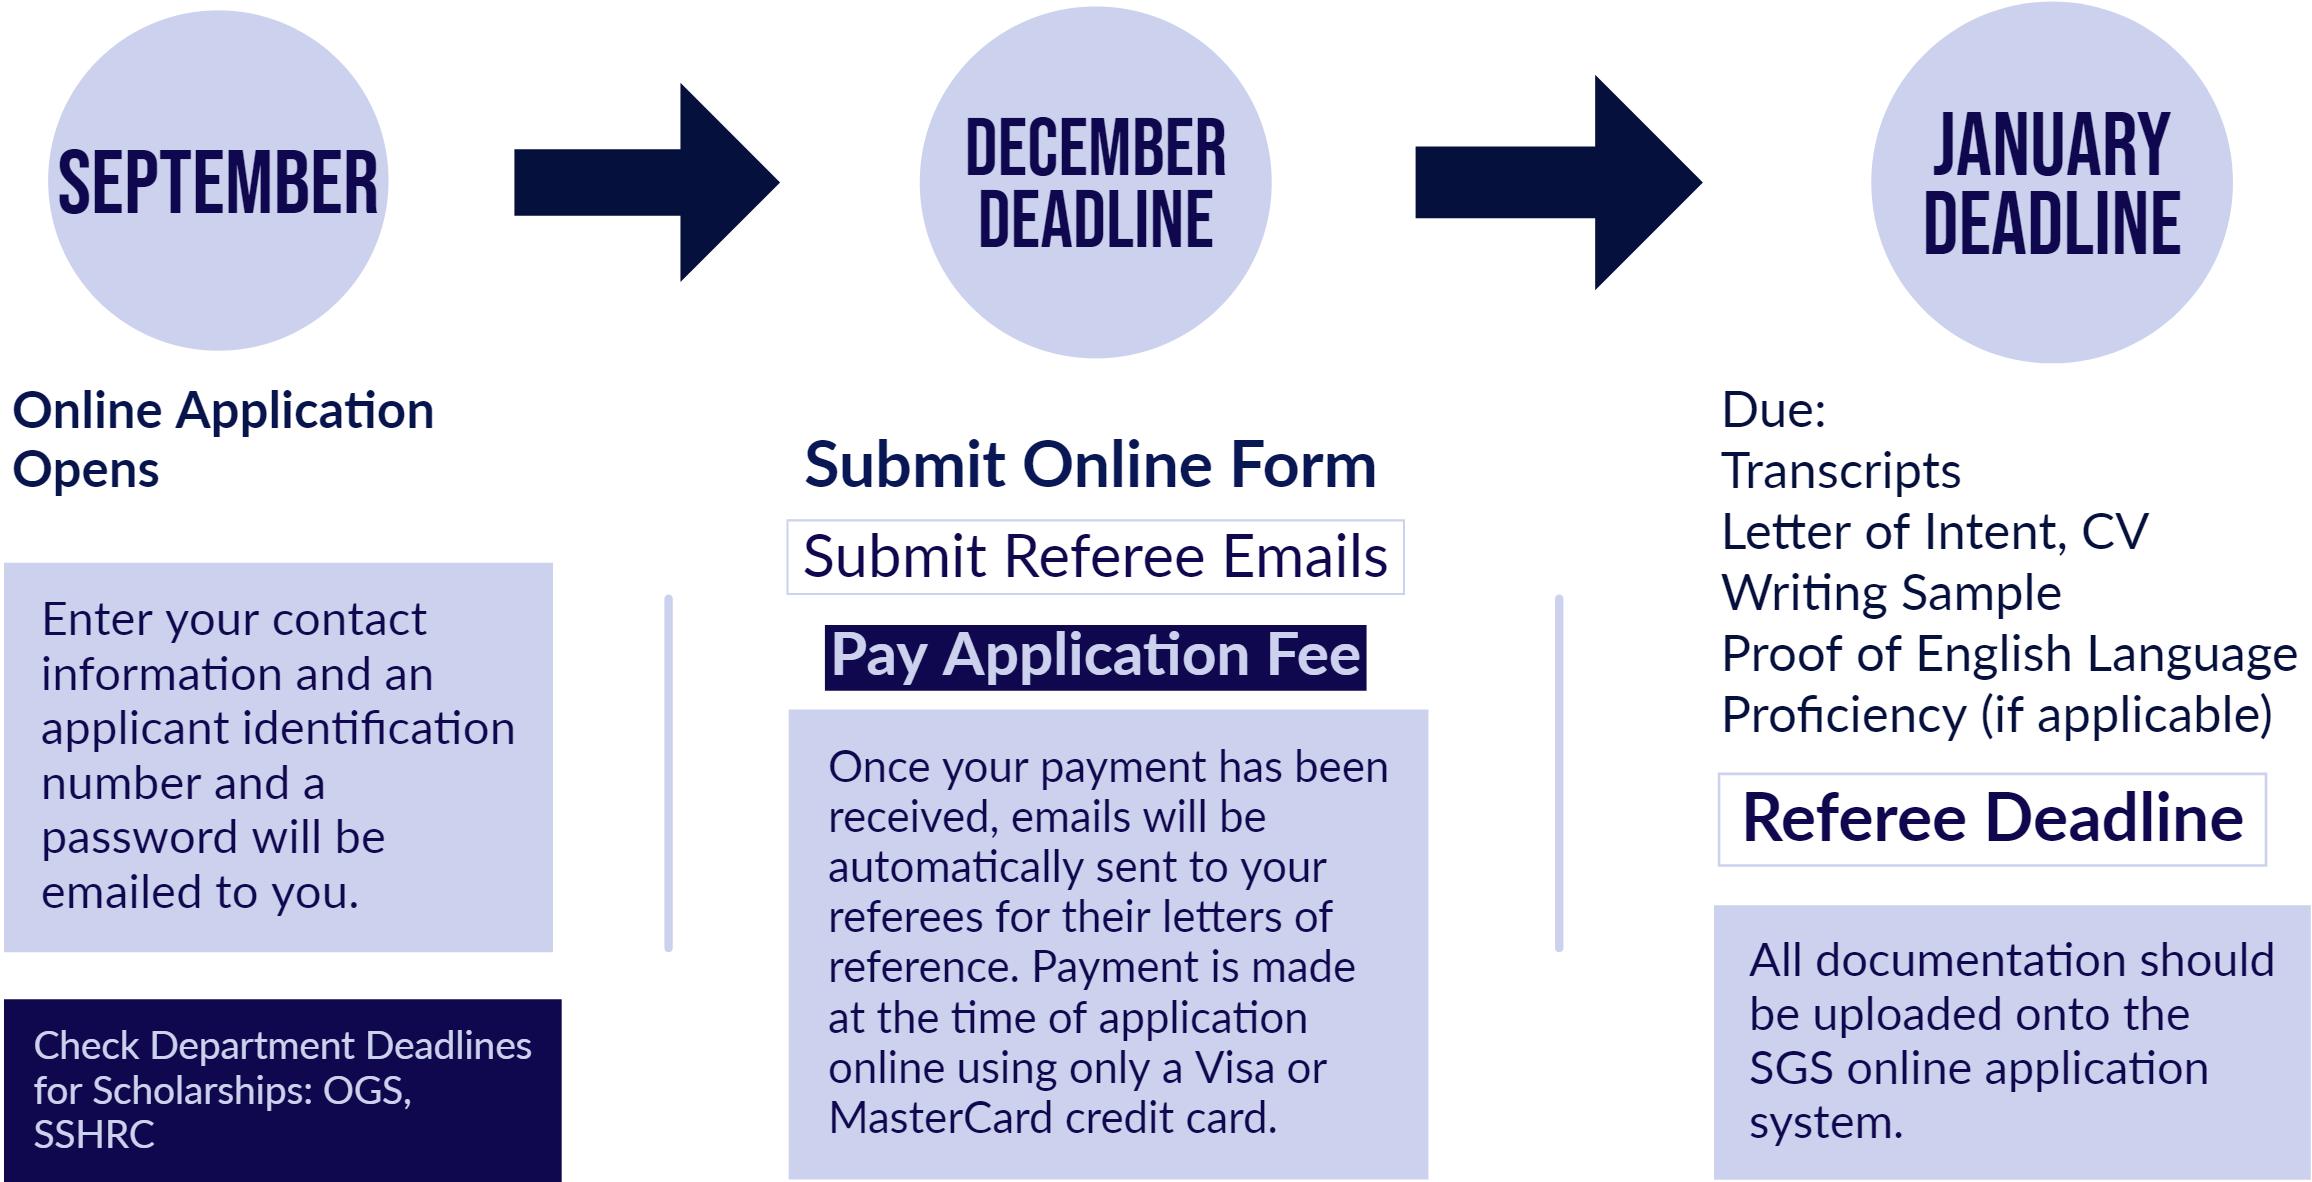 Timeline: December Deadline, Pay Application; January Deadline, Upload Supporting Documents